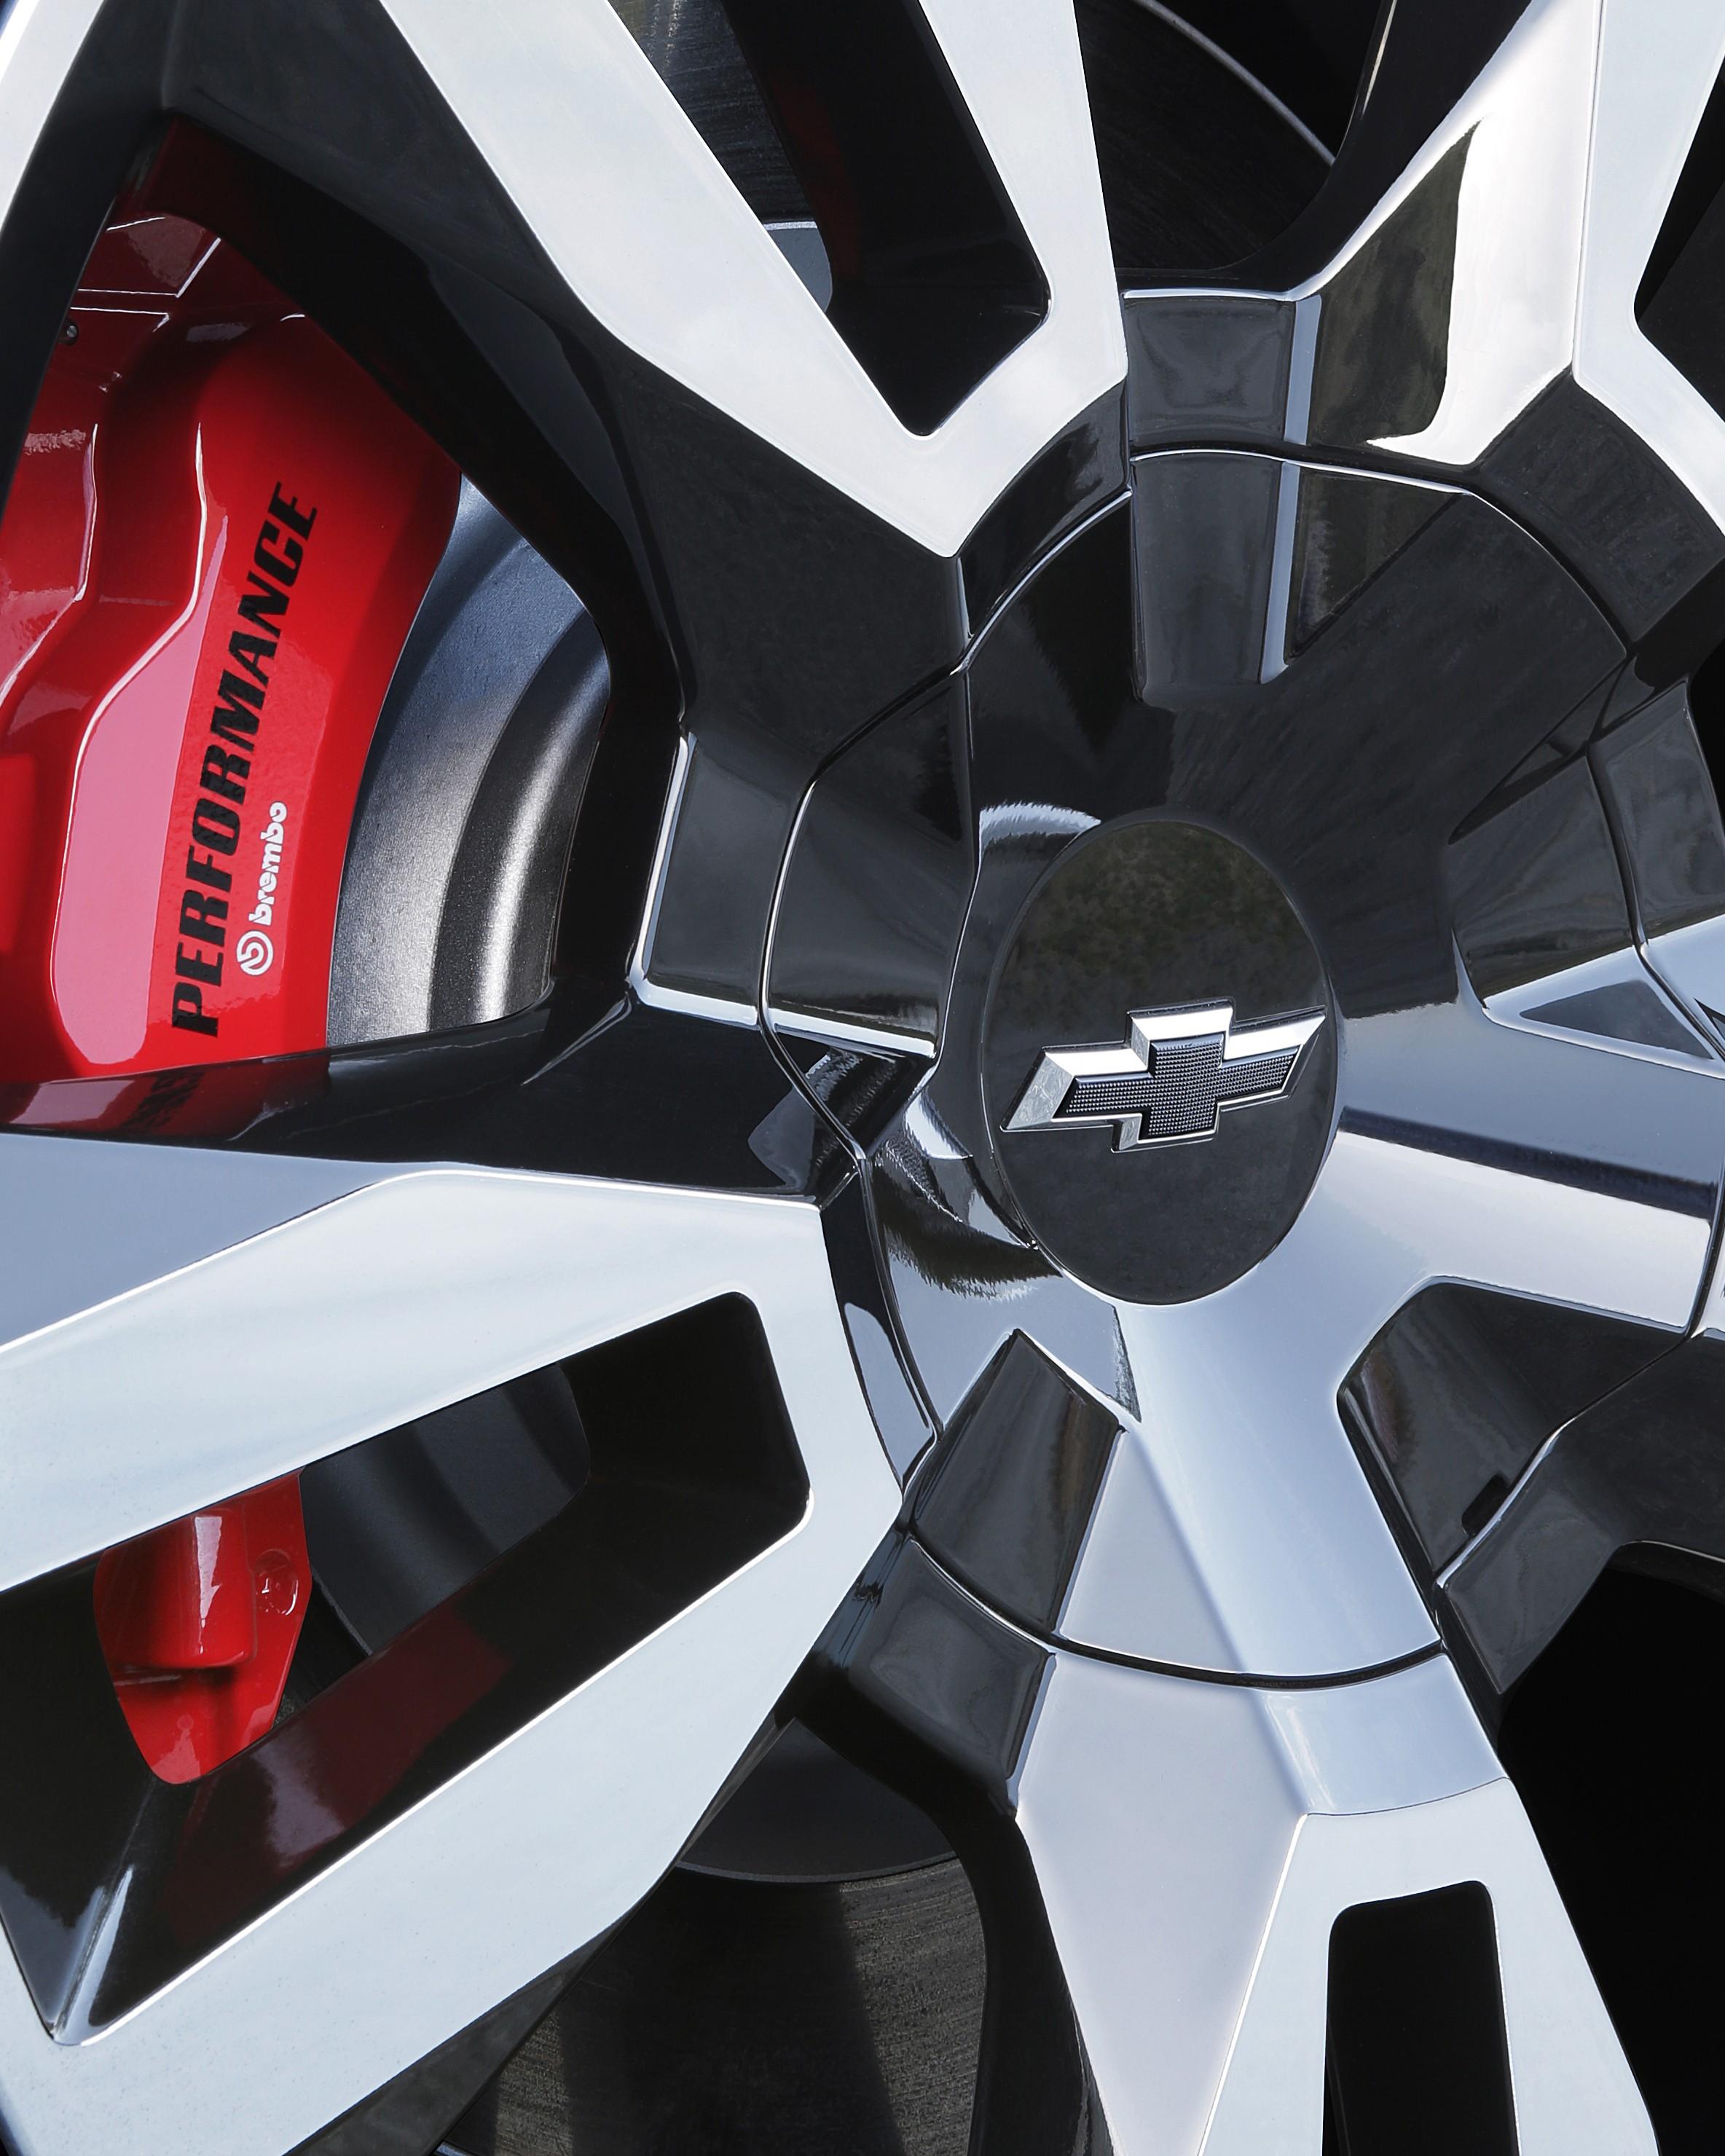 general motors has car sharing plans for china  sends 16 en-v evs to shanghai